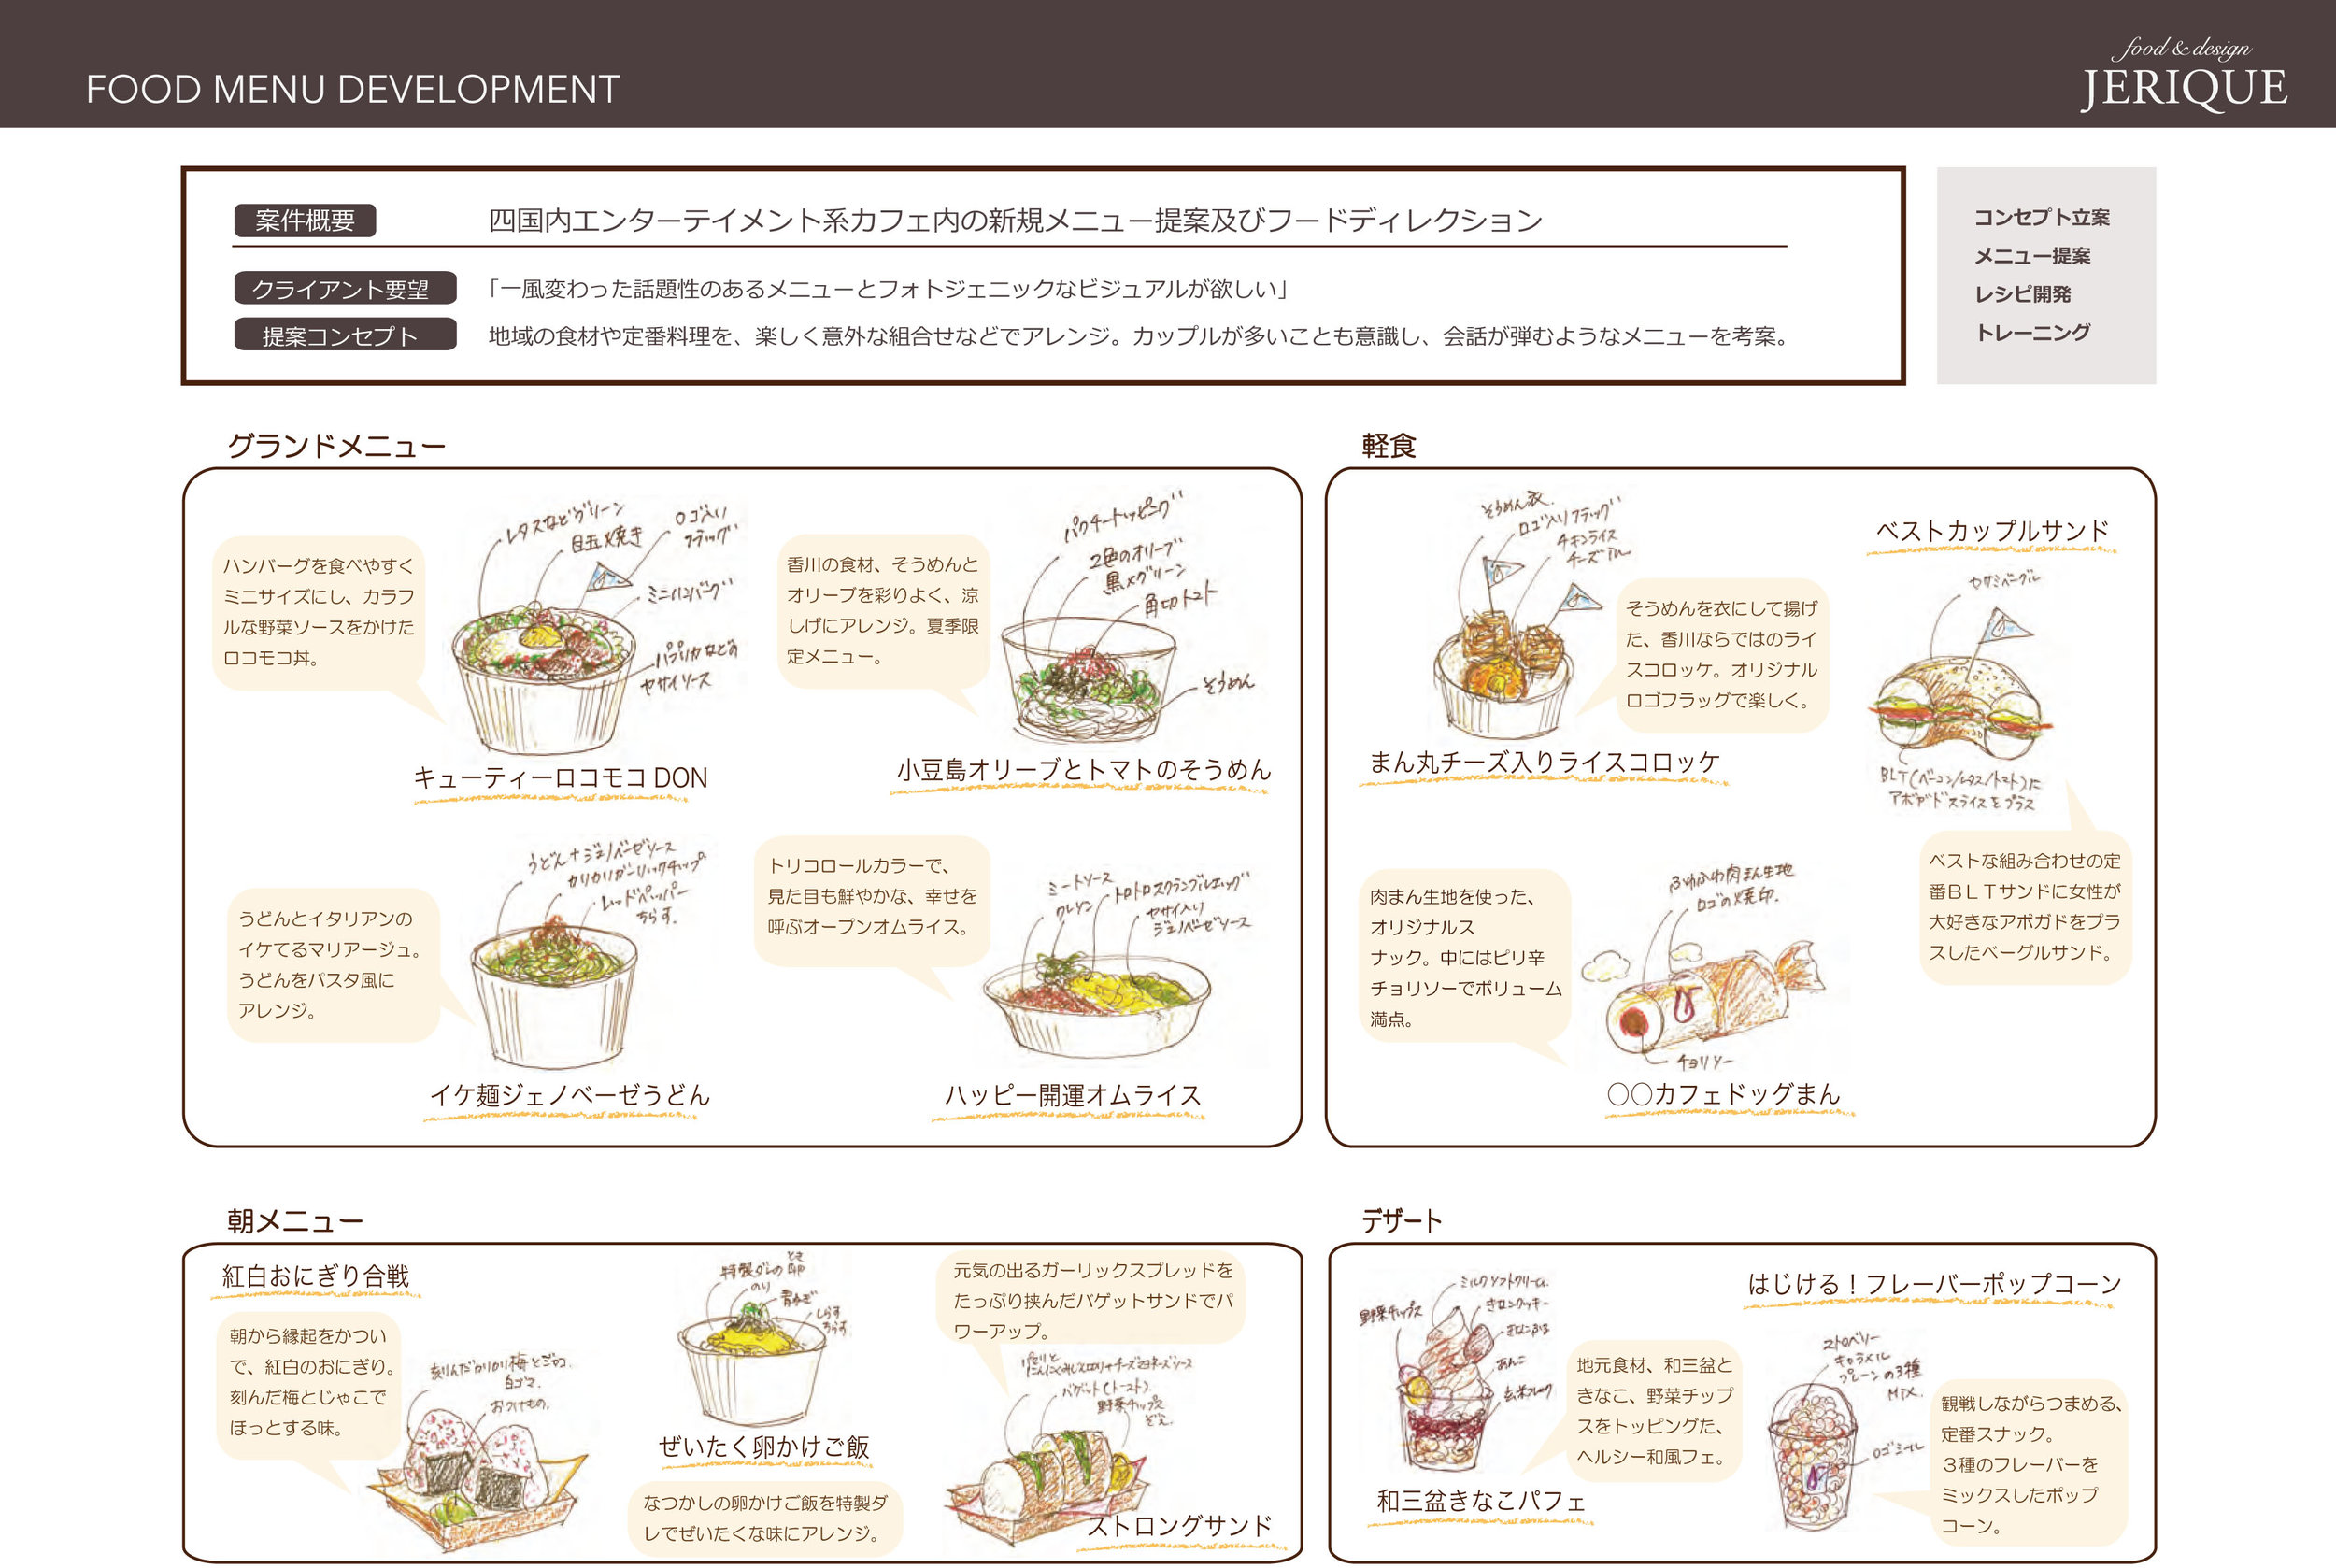 JERIQUE_FOOD DEVELOPMENT-1.jpg